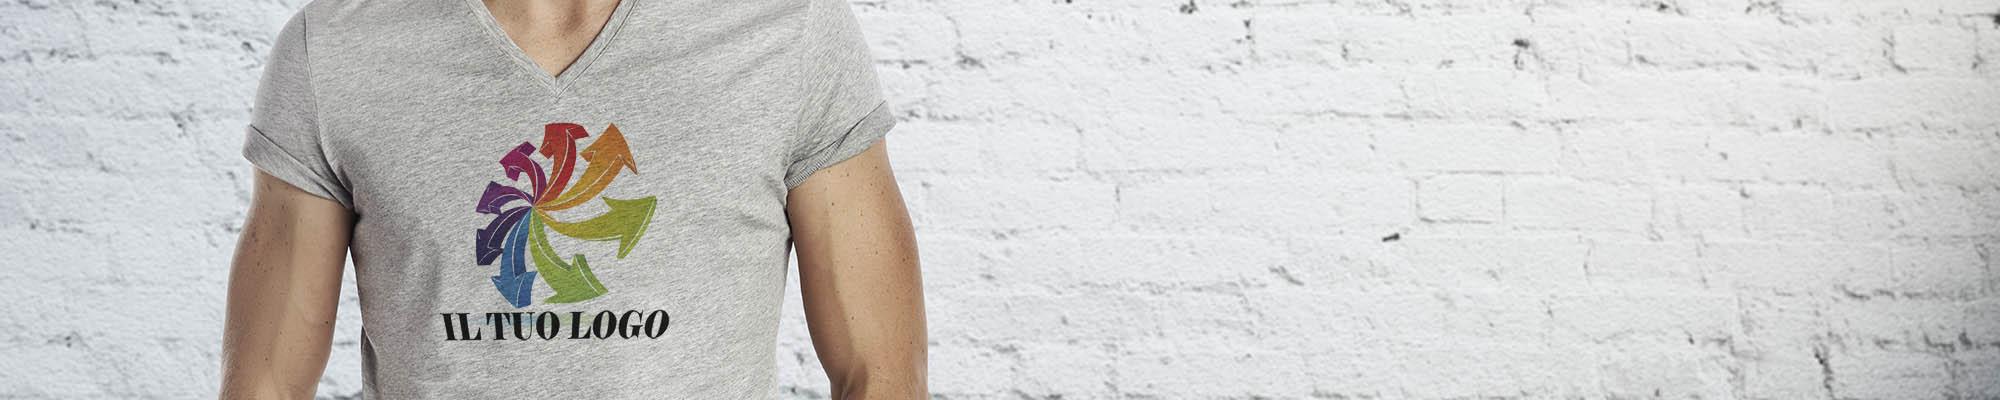 stampare t shirt personalizzate logo